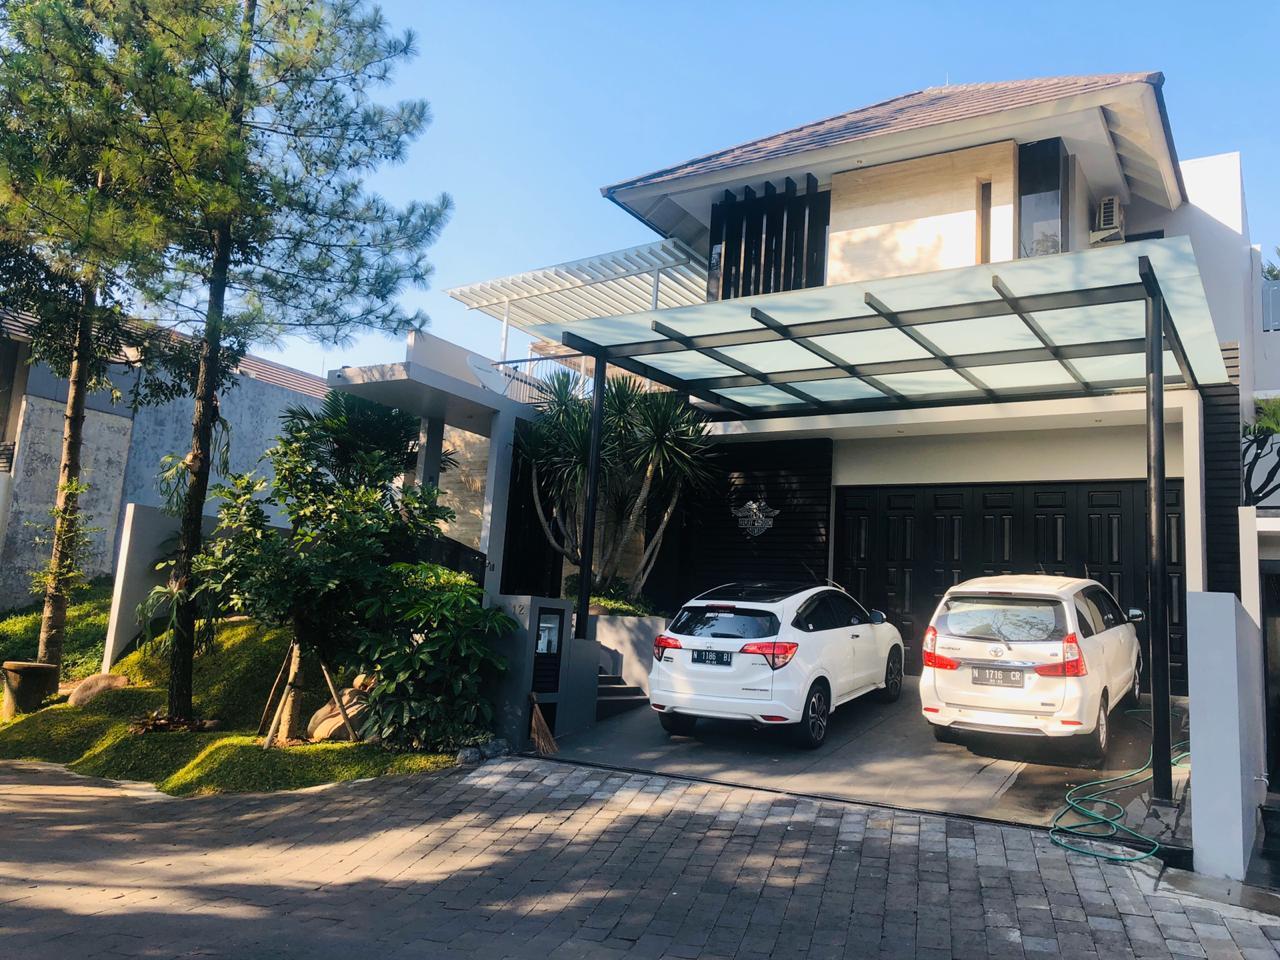 Carport Minimalis, Carport Mobil, Garasi Mobil, Carport Modern, Carport Rumah Mewah,